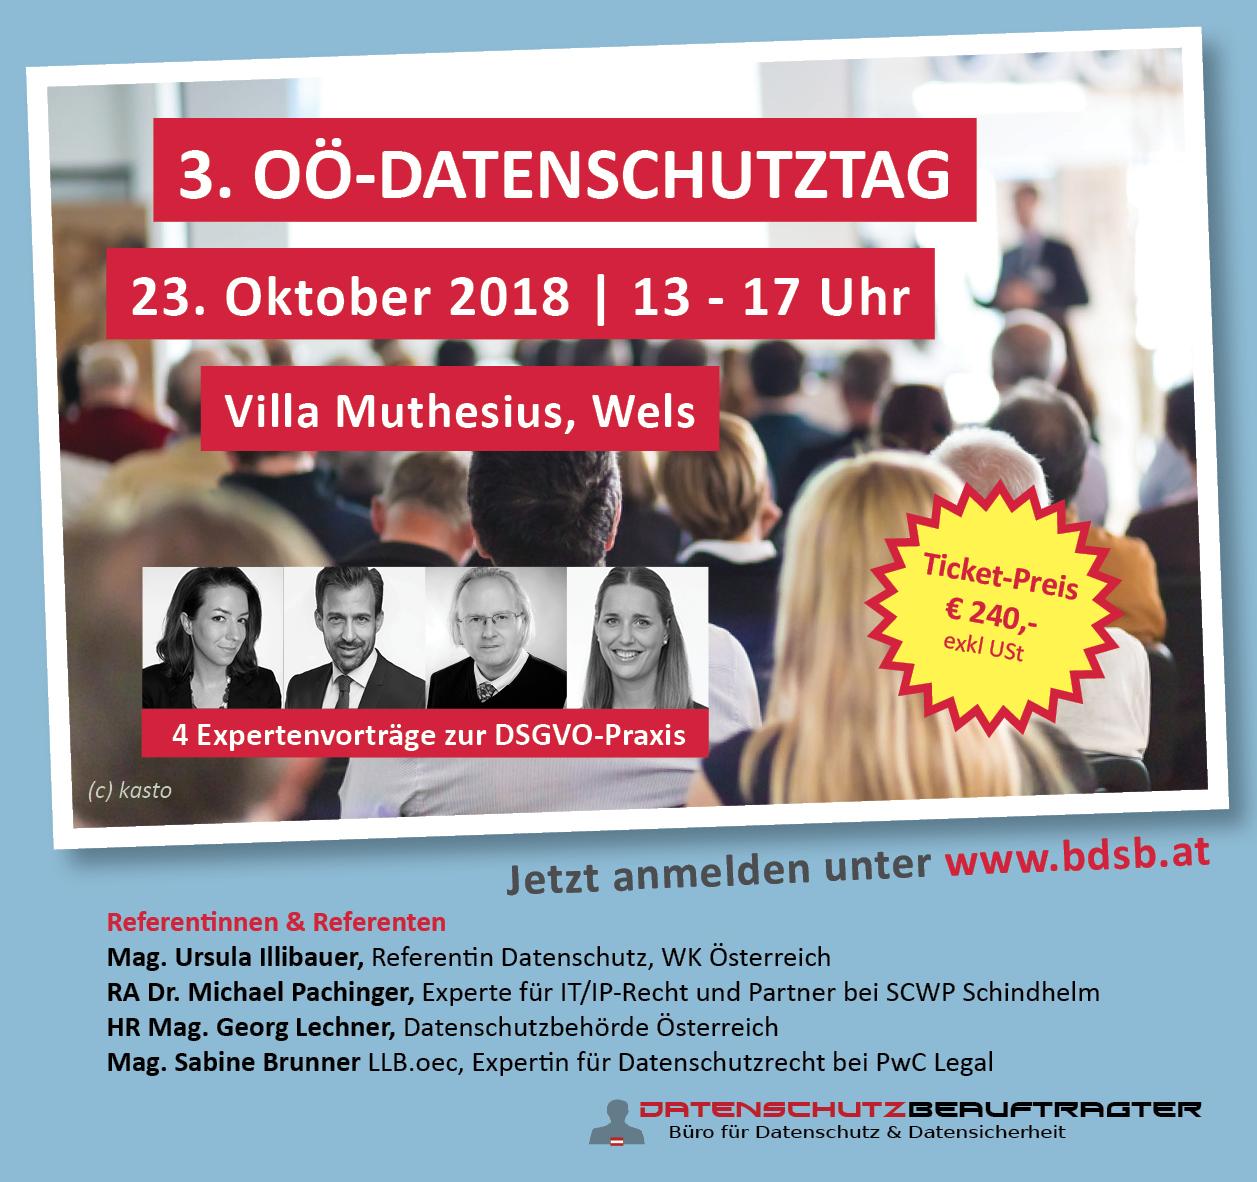 3. OÖ-Datenschutztag | 23.10.2018 | Wels